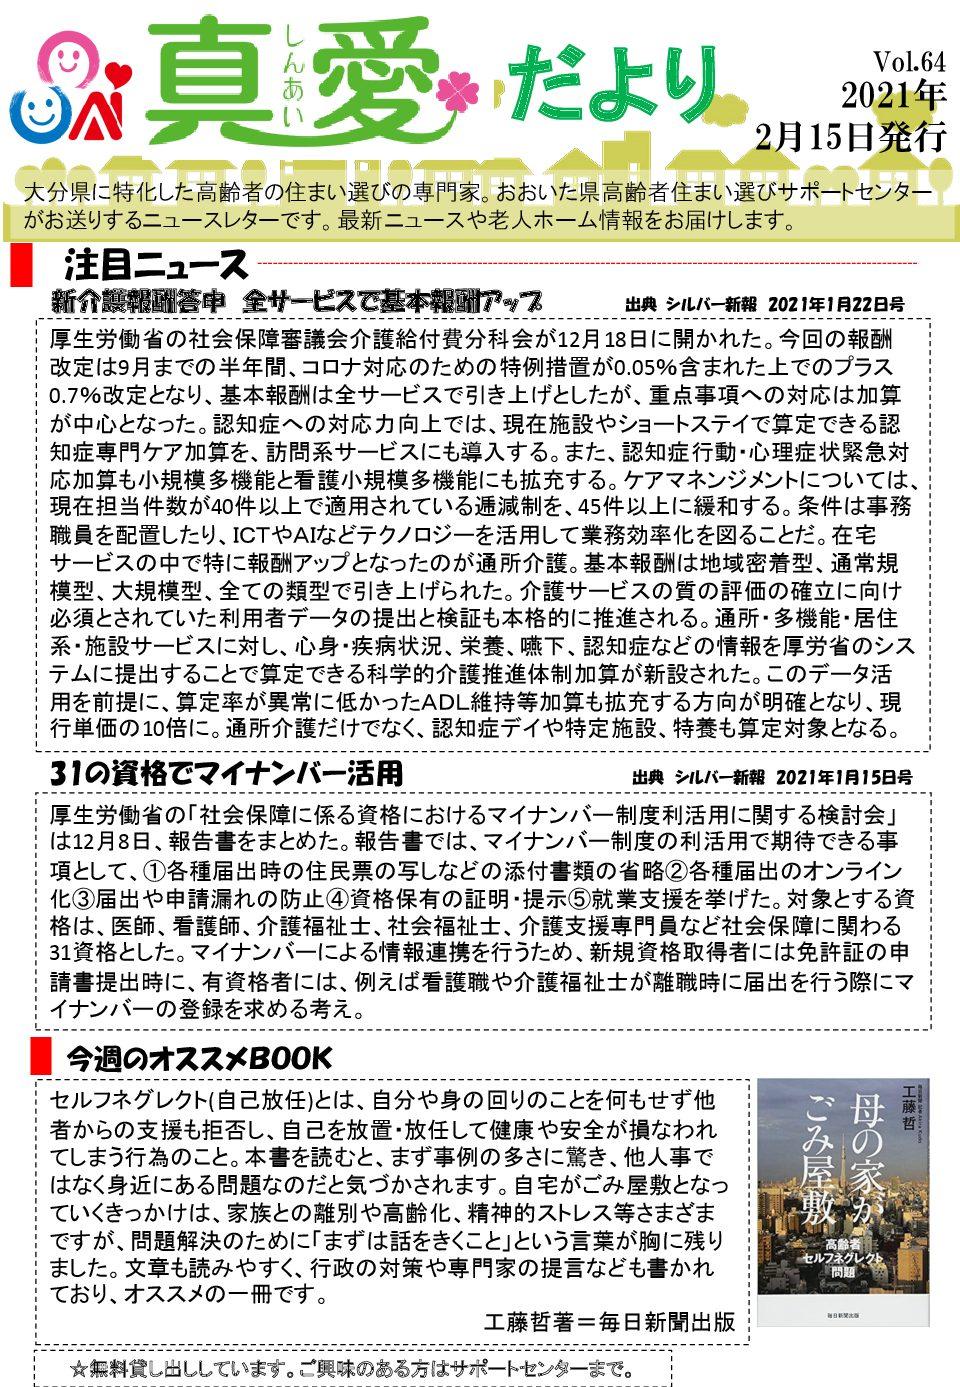 【vol.64】 2021.02.15発行